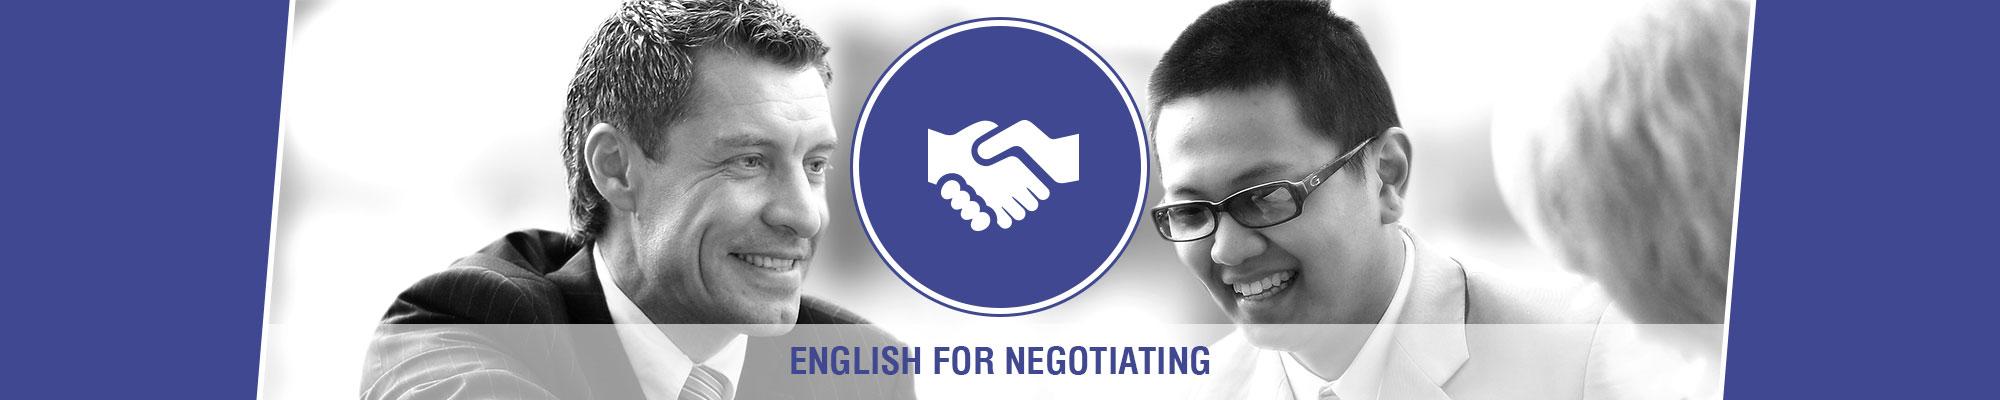 Anglokom Corporate Language Bangkok - English for Negotiations